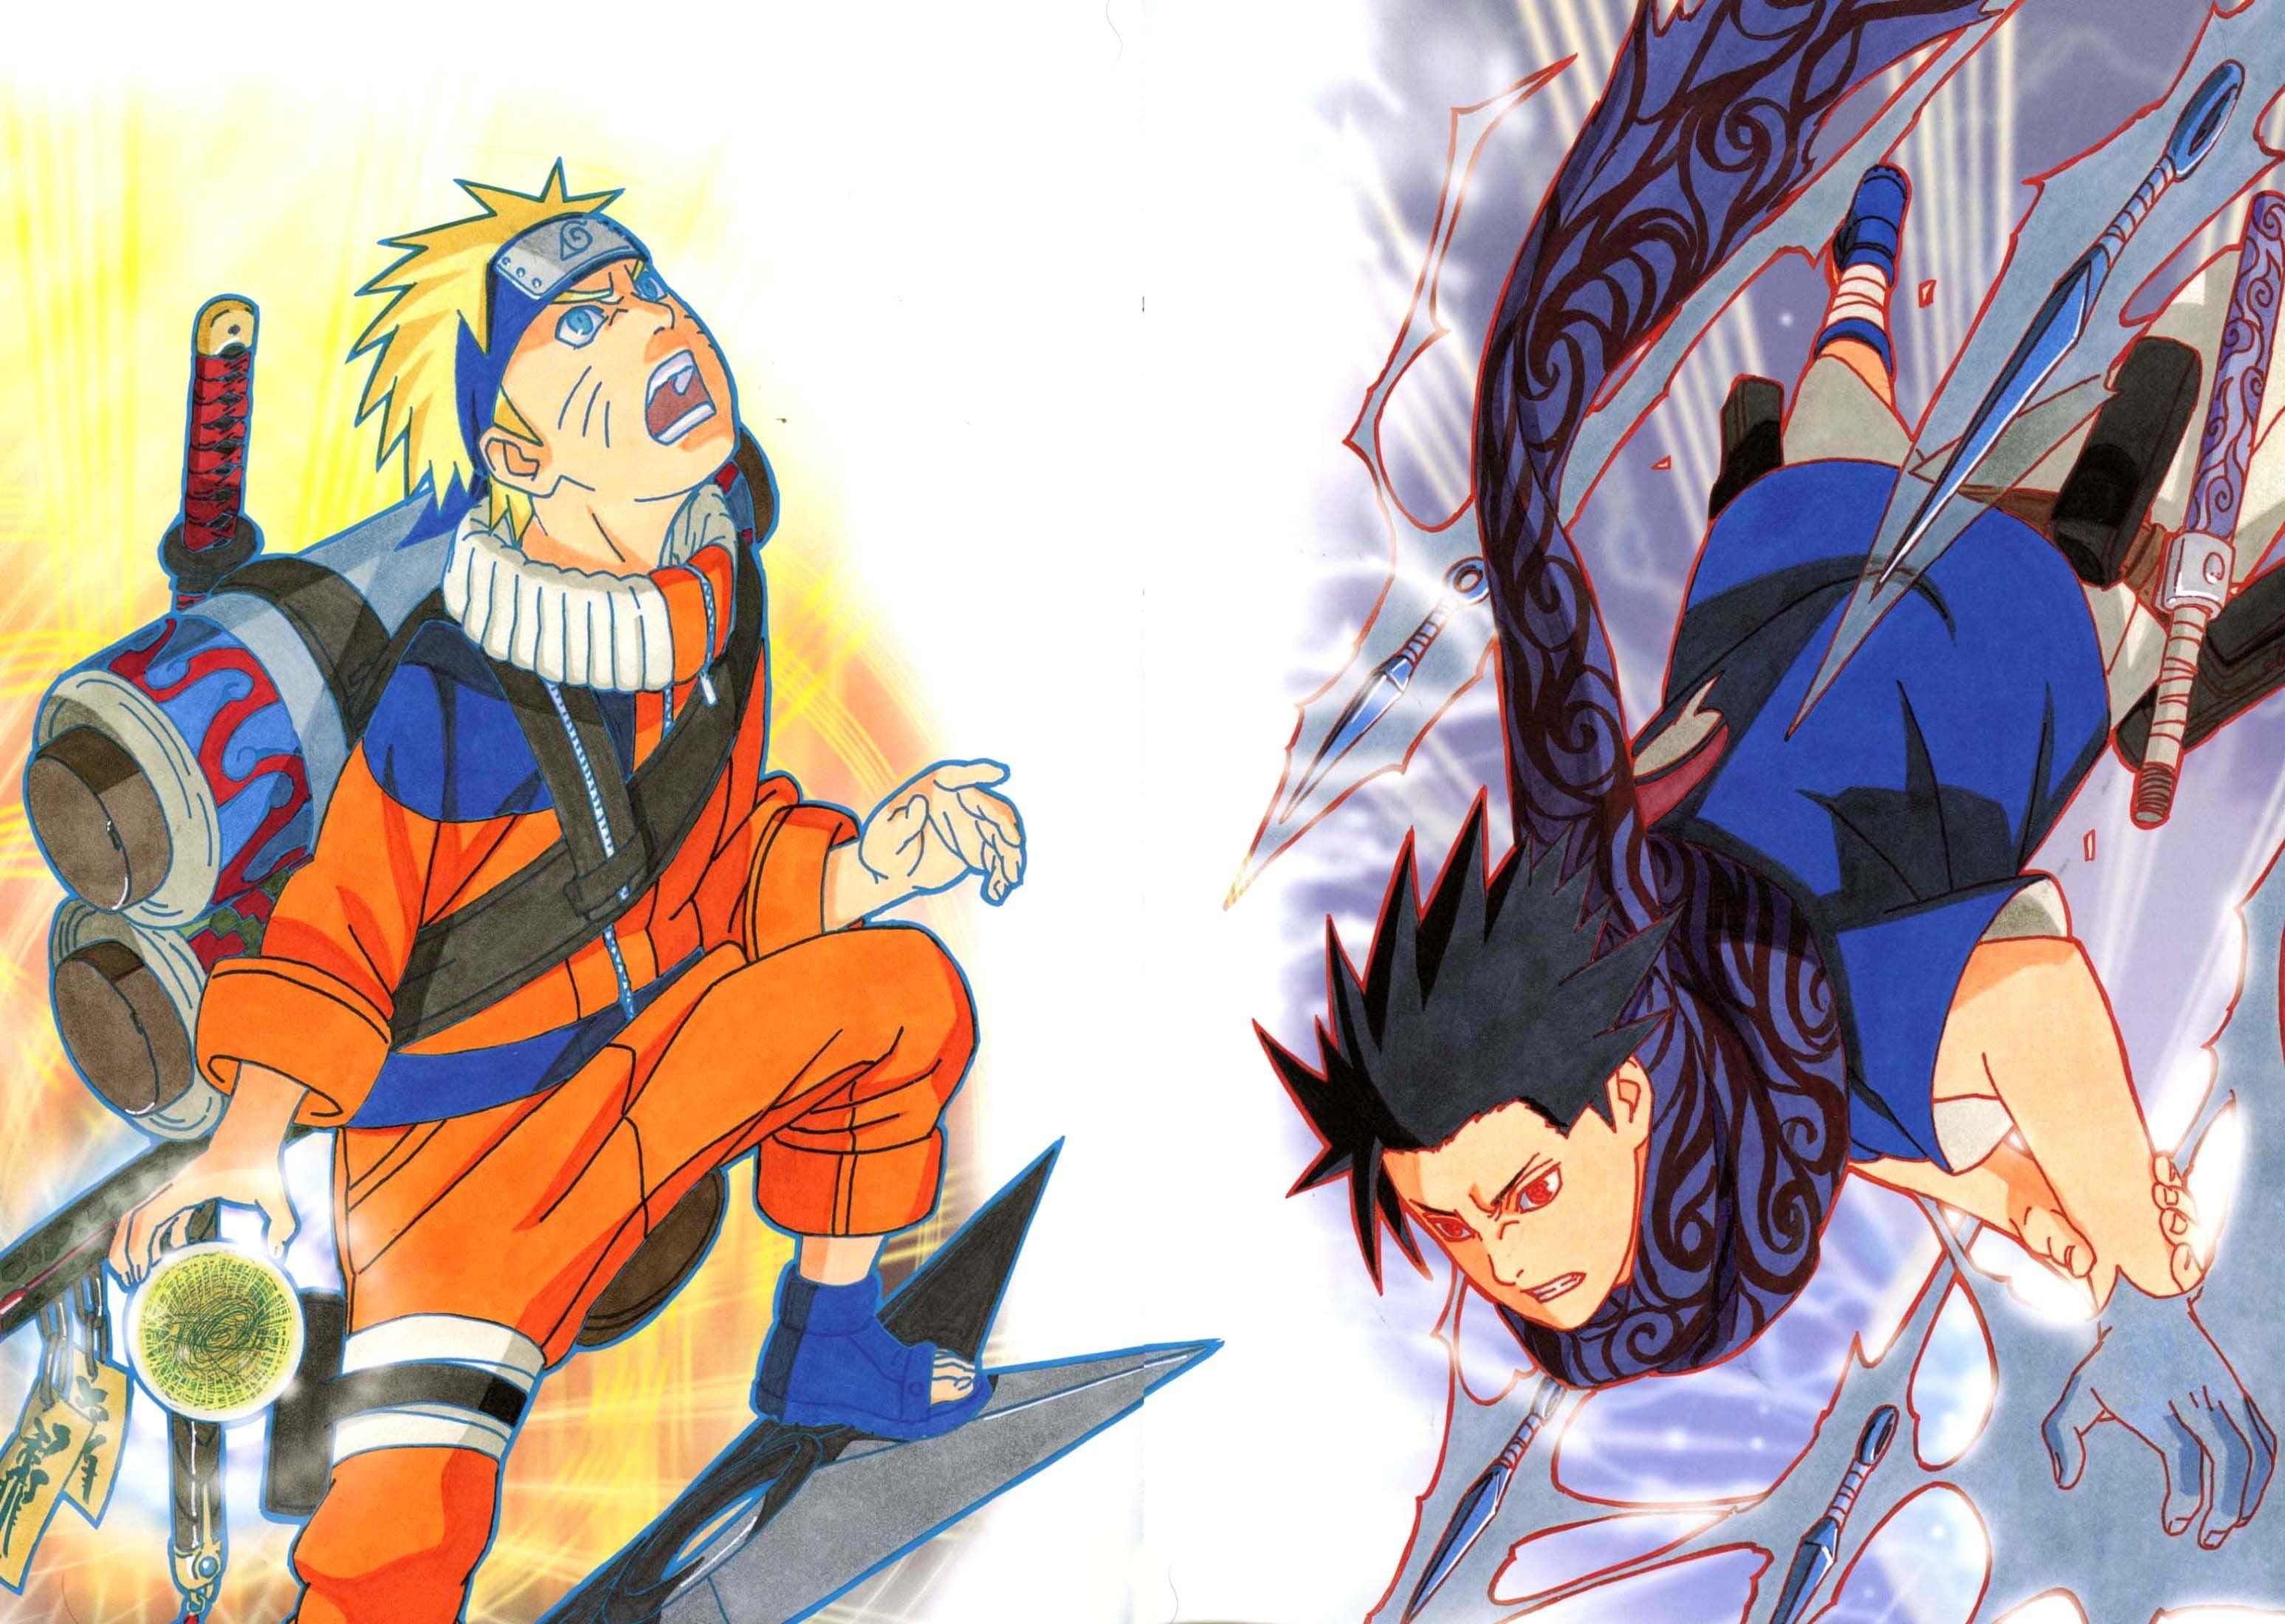 Naruto And Sasuke Kishimoto - HD Wallpaper